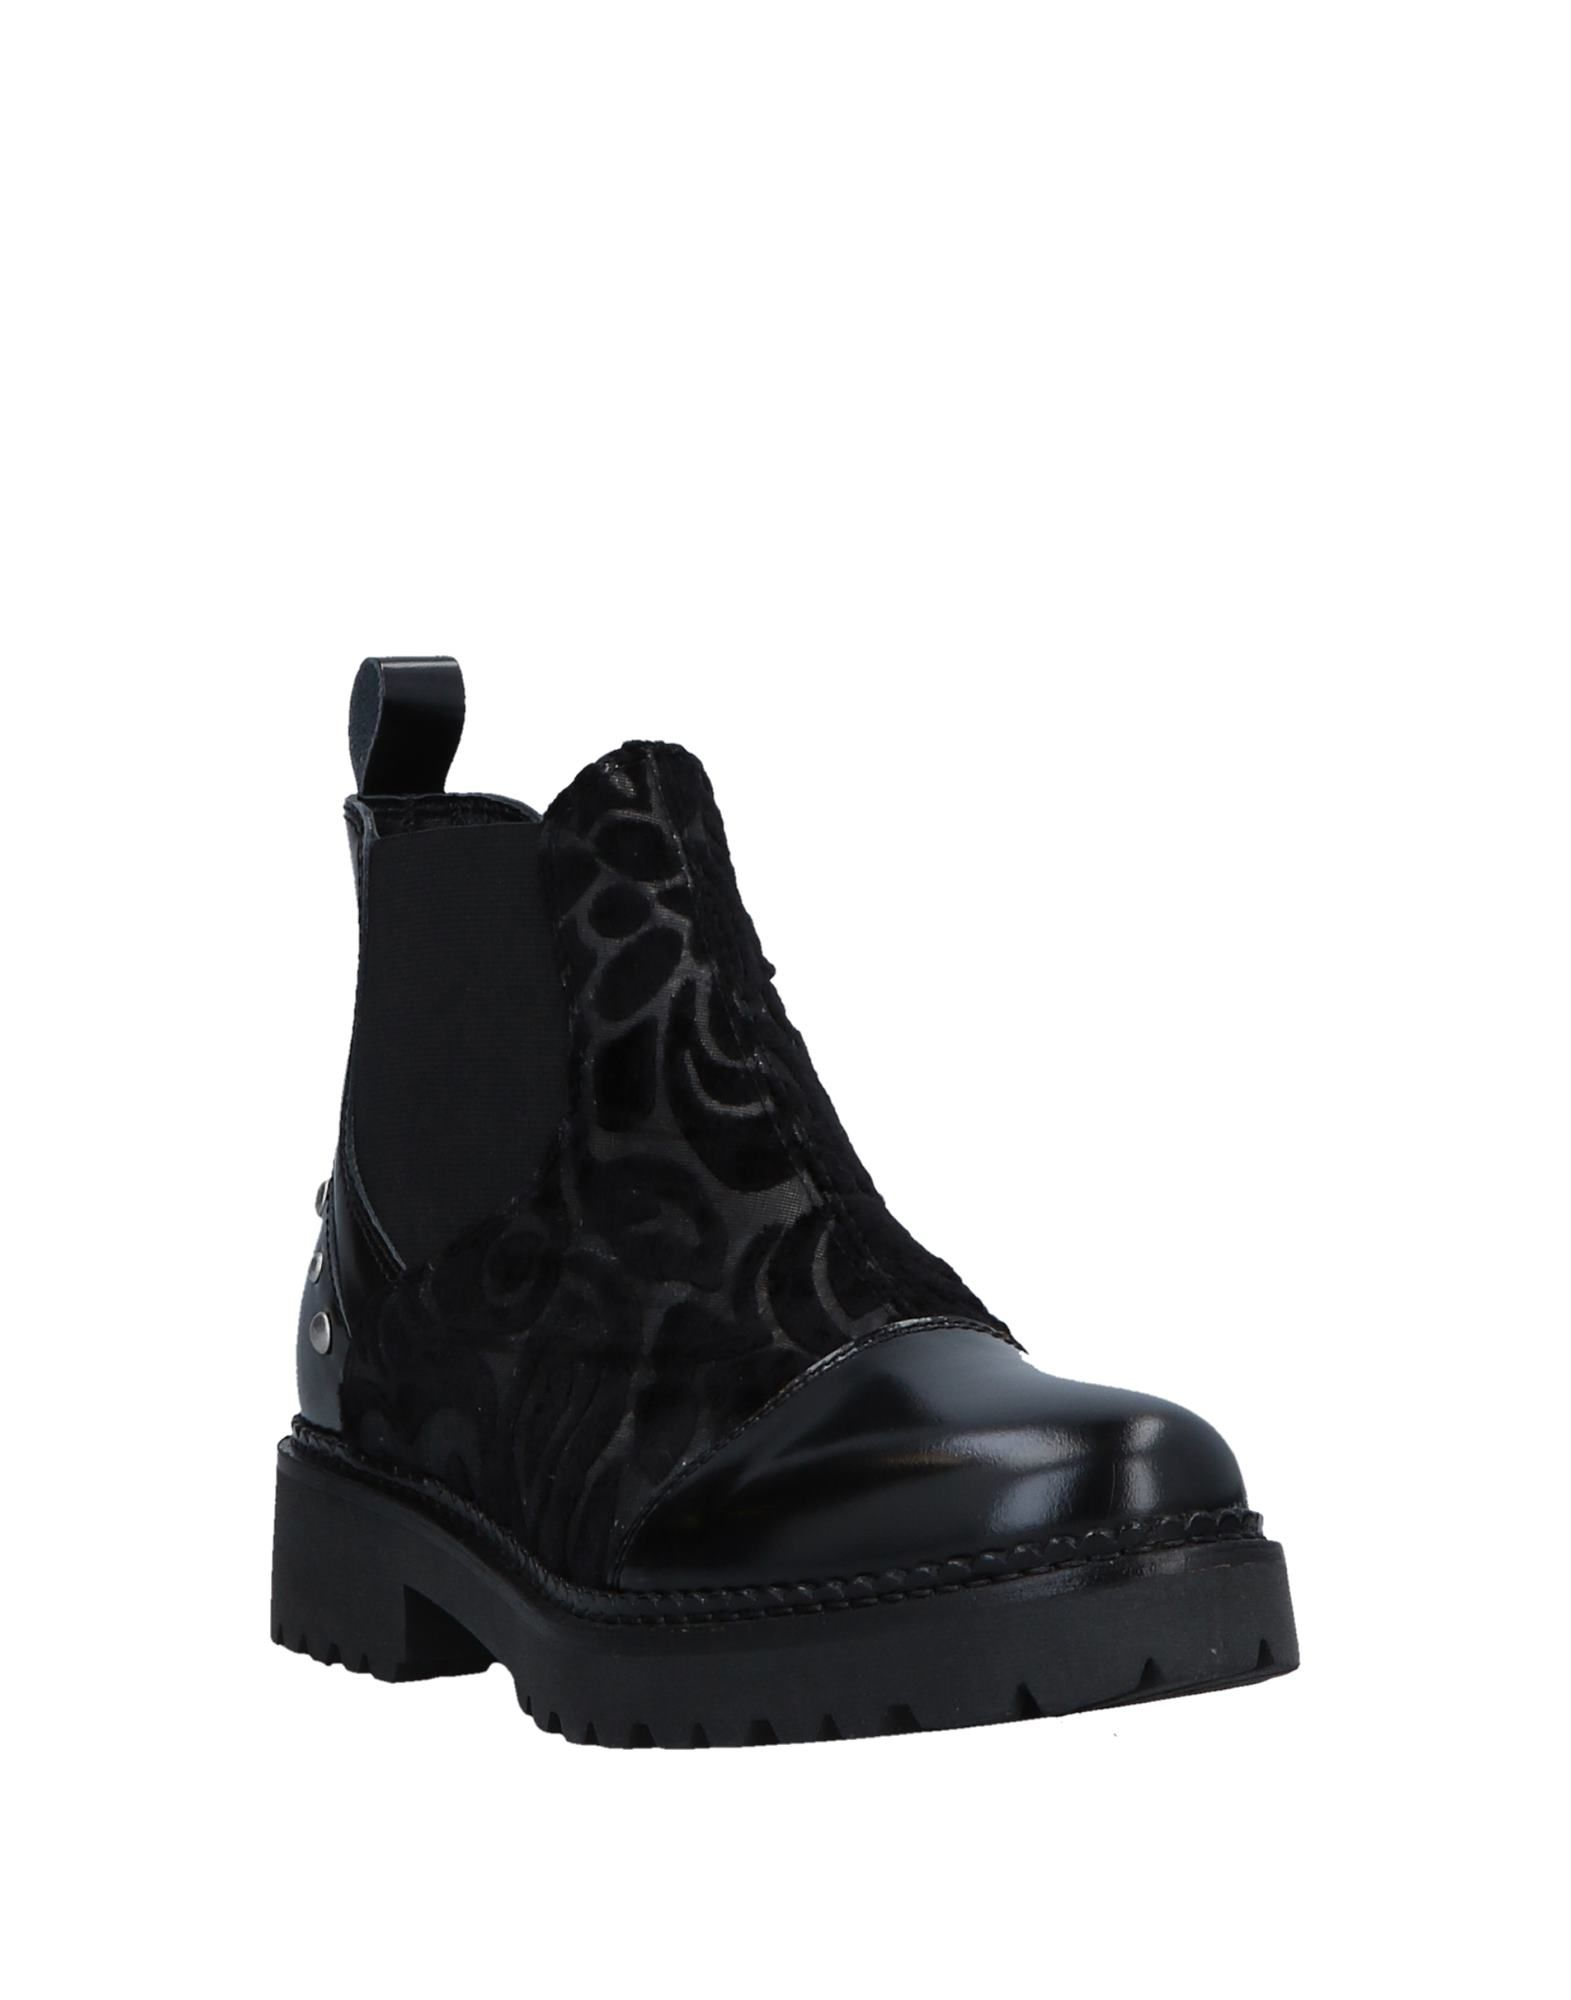 Apepazza Gute Stiefelette Damen  11516829PJ Gute Apepazza Qualität beliebte Schuhe bd66e8